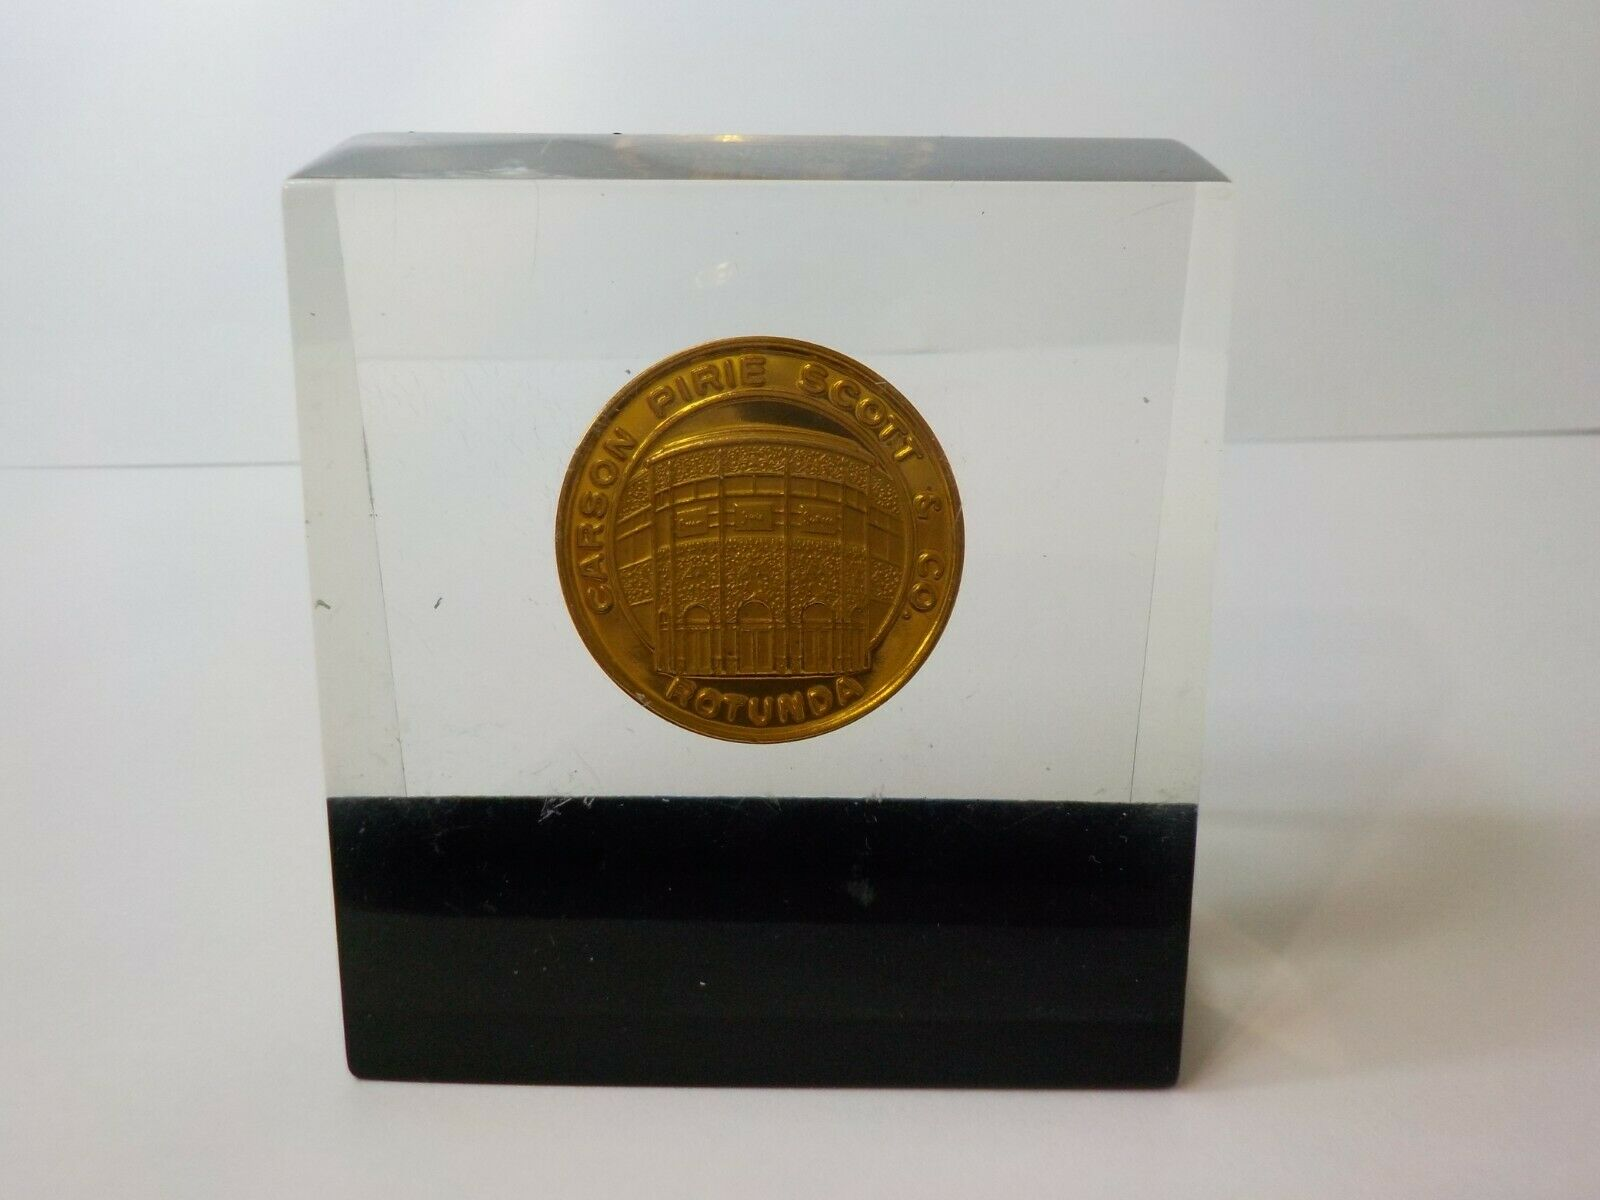 CARSON PIRIE SCOTT & CO ROTUNDA $25.00 COIN LOUIS H SULLIVAN LUCITE PAPERWEIGHT